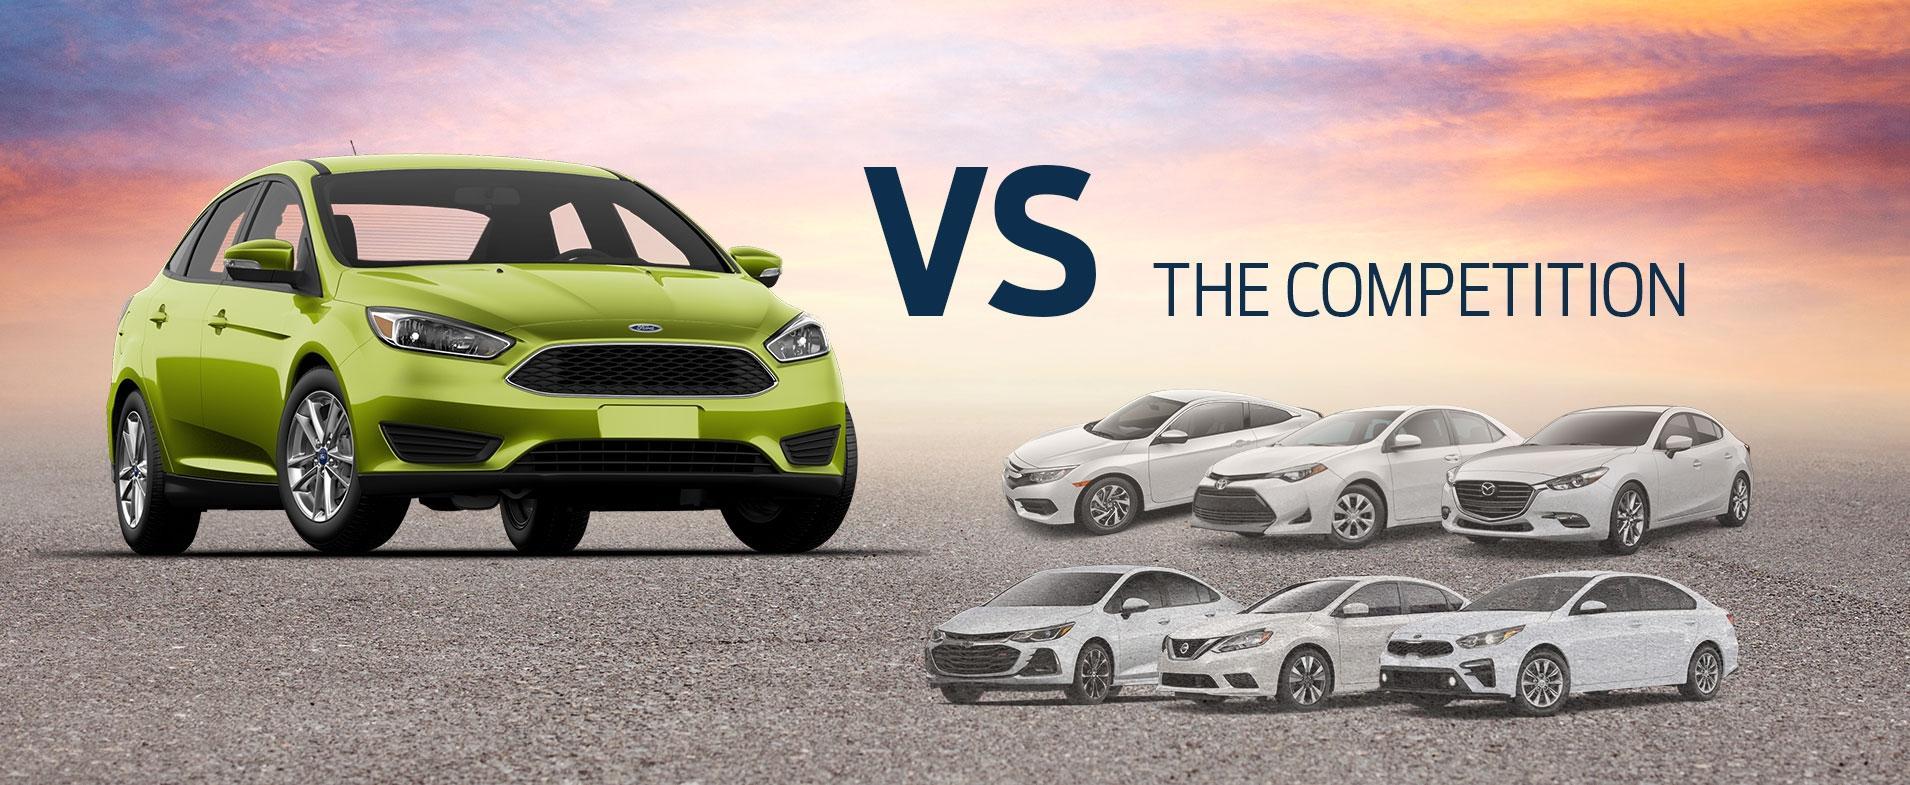 Focus vs Competition